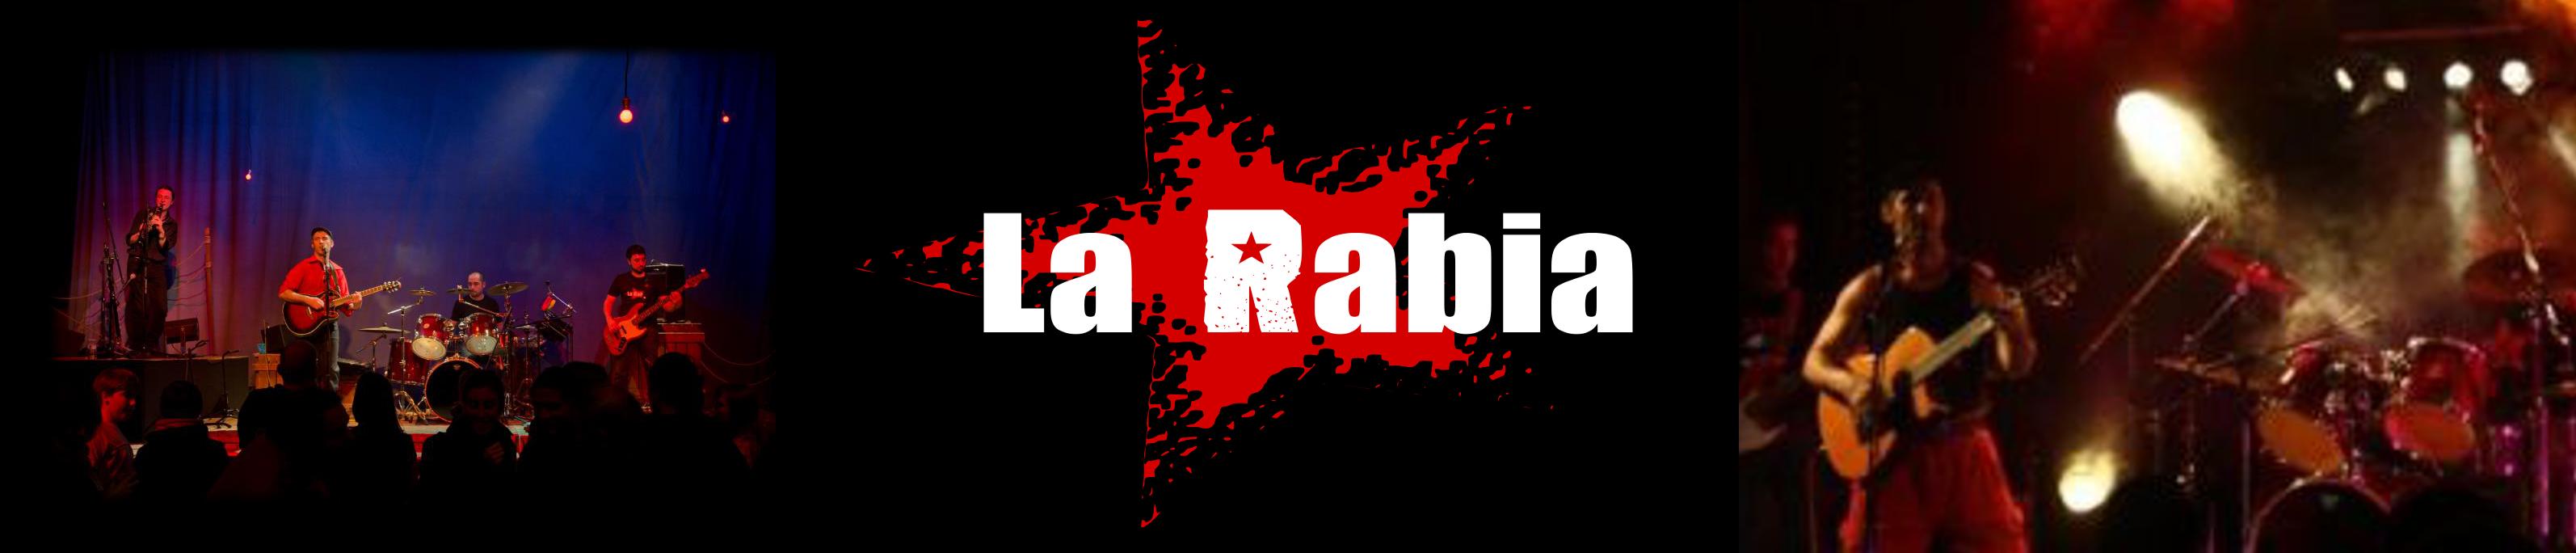 index [www.la-rabia.fr]